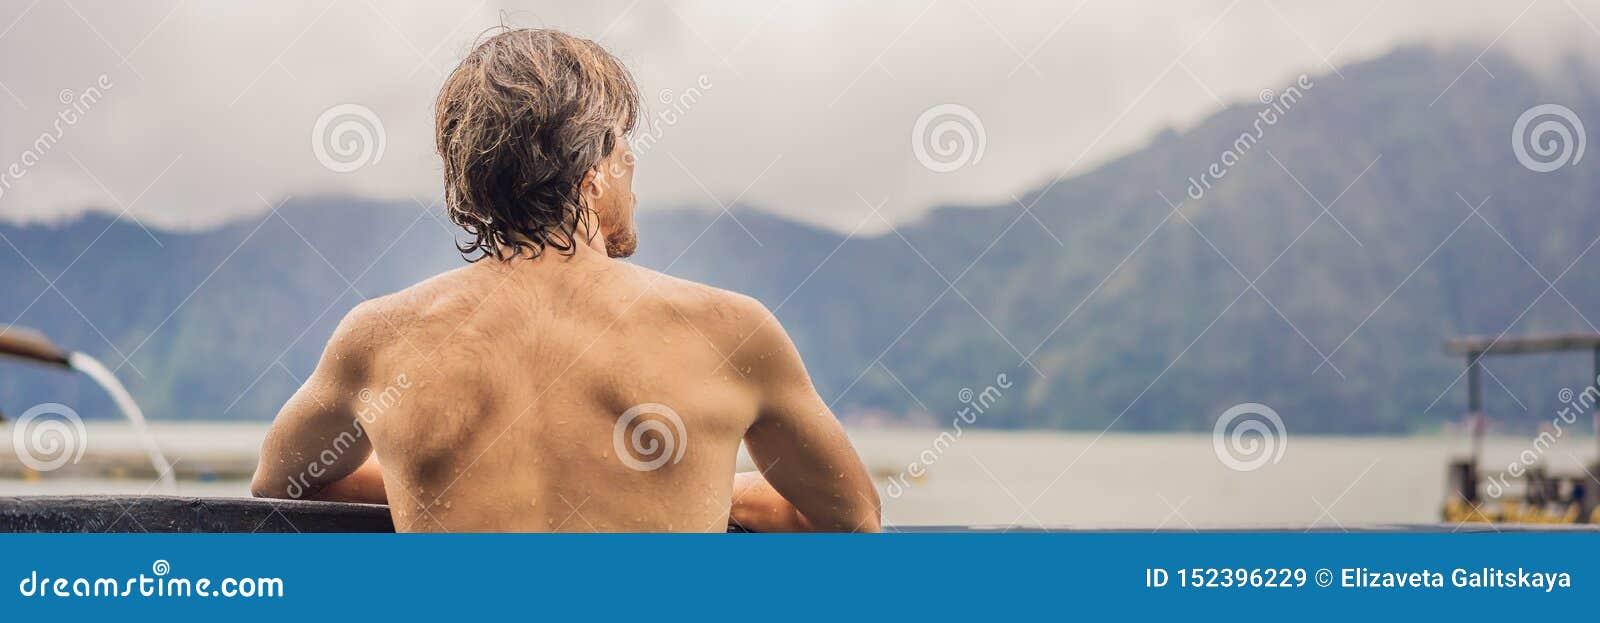 Geothermal Spa Χαλάρωση ατόμων στην καυτή λίμνη άνοιξη Νεαρός άνδρας που απολαμβάνει το λούσιμο που χαλαρώνουν σε μια μπλε λιμνοθ